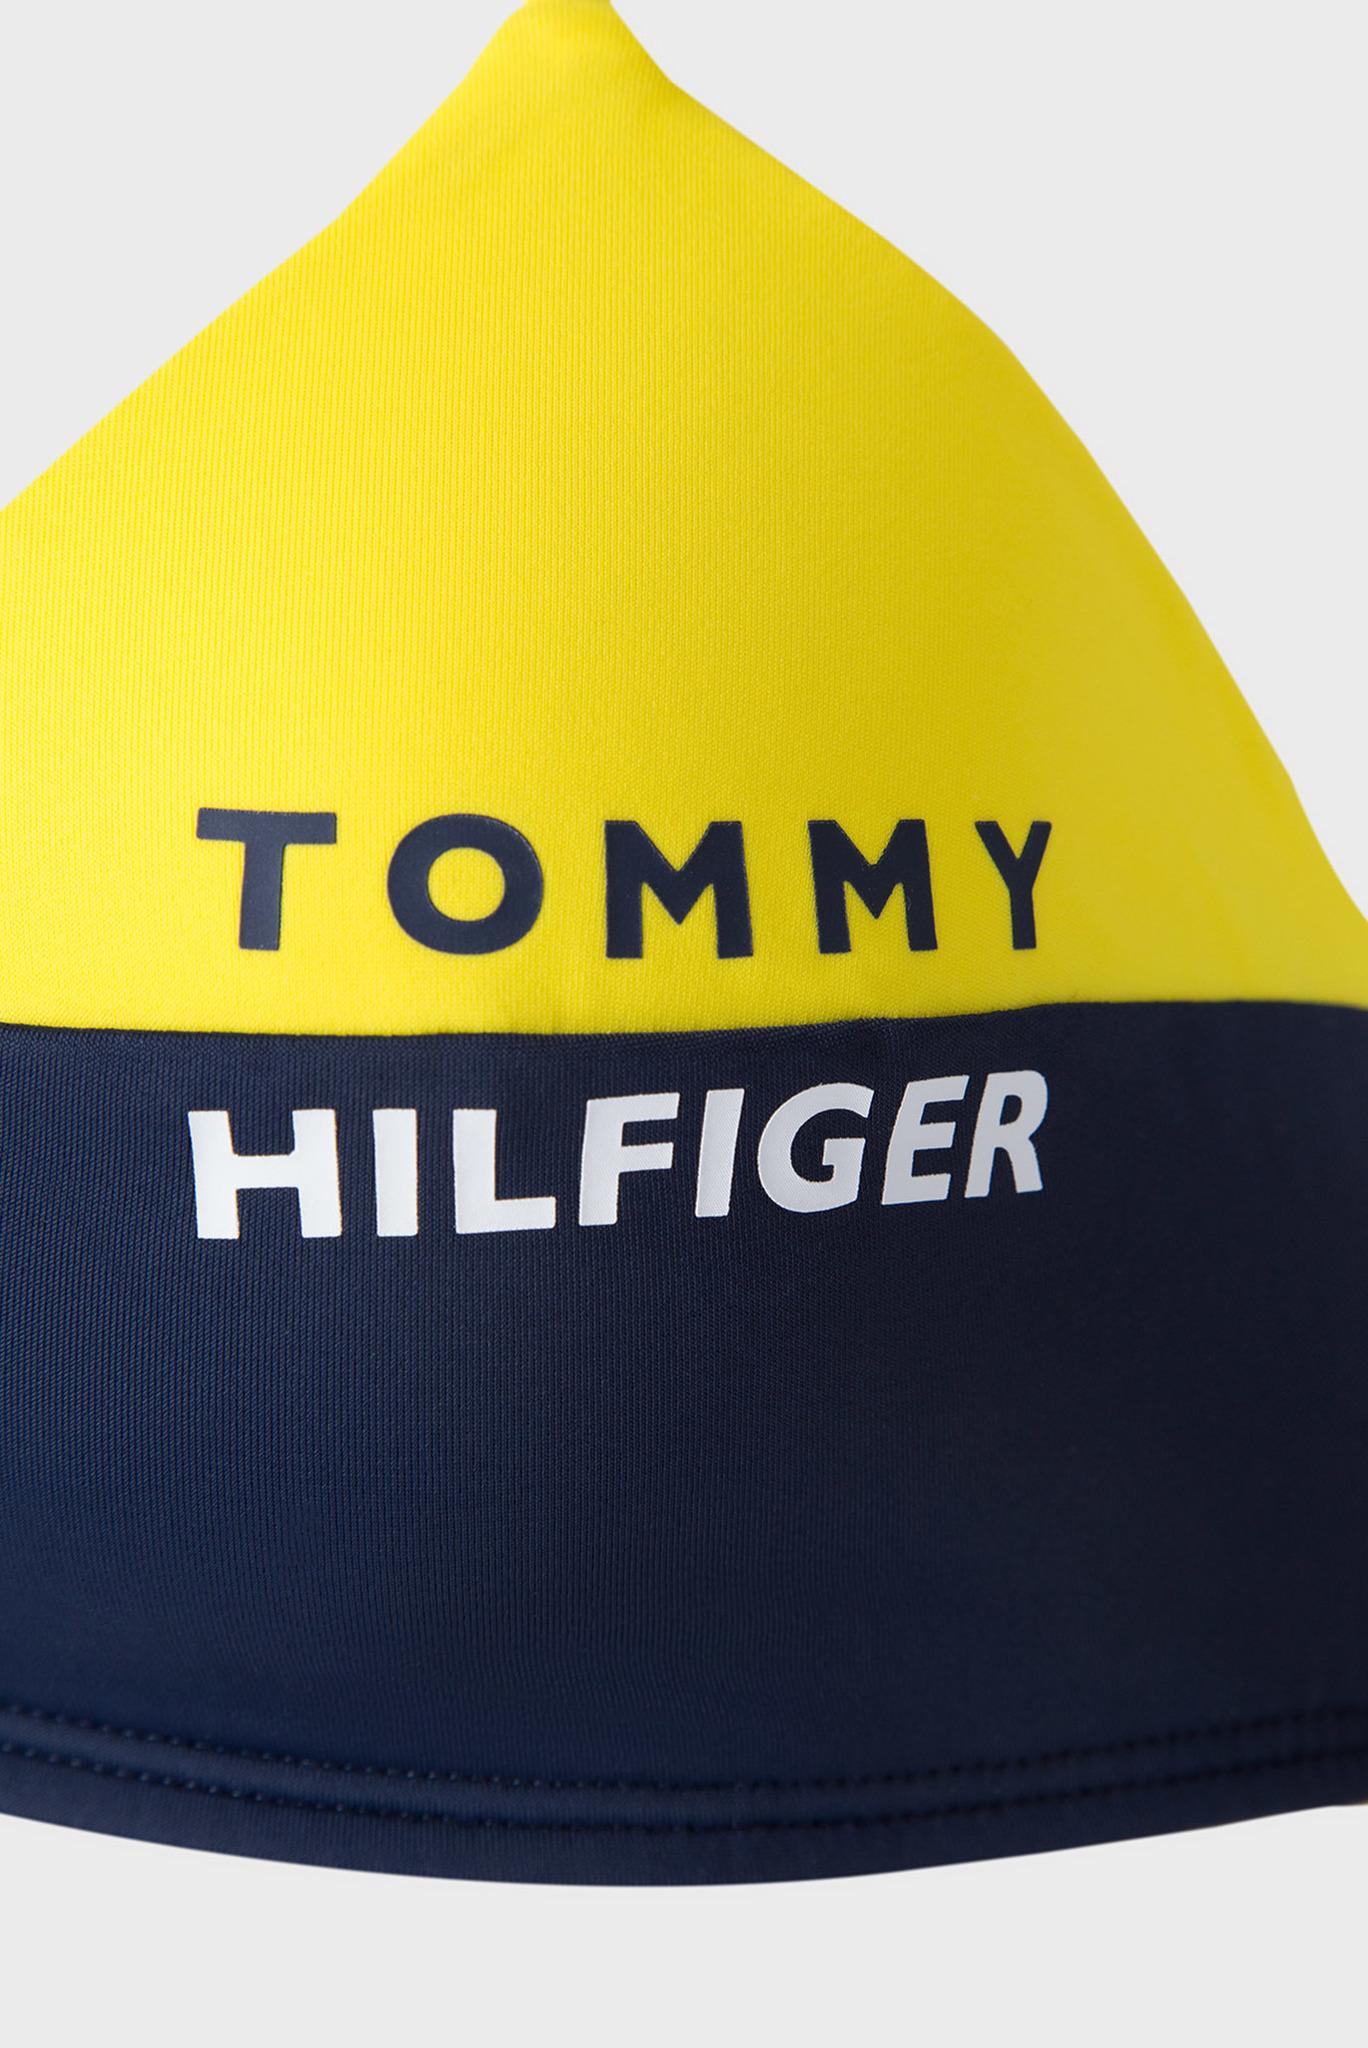 Женский желтый лиф от купальника Tommy Hilfiger